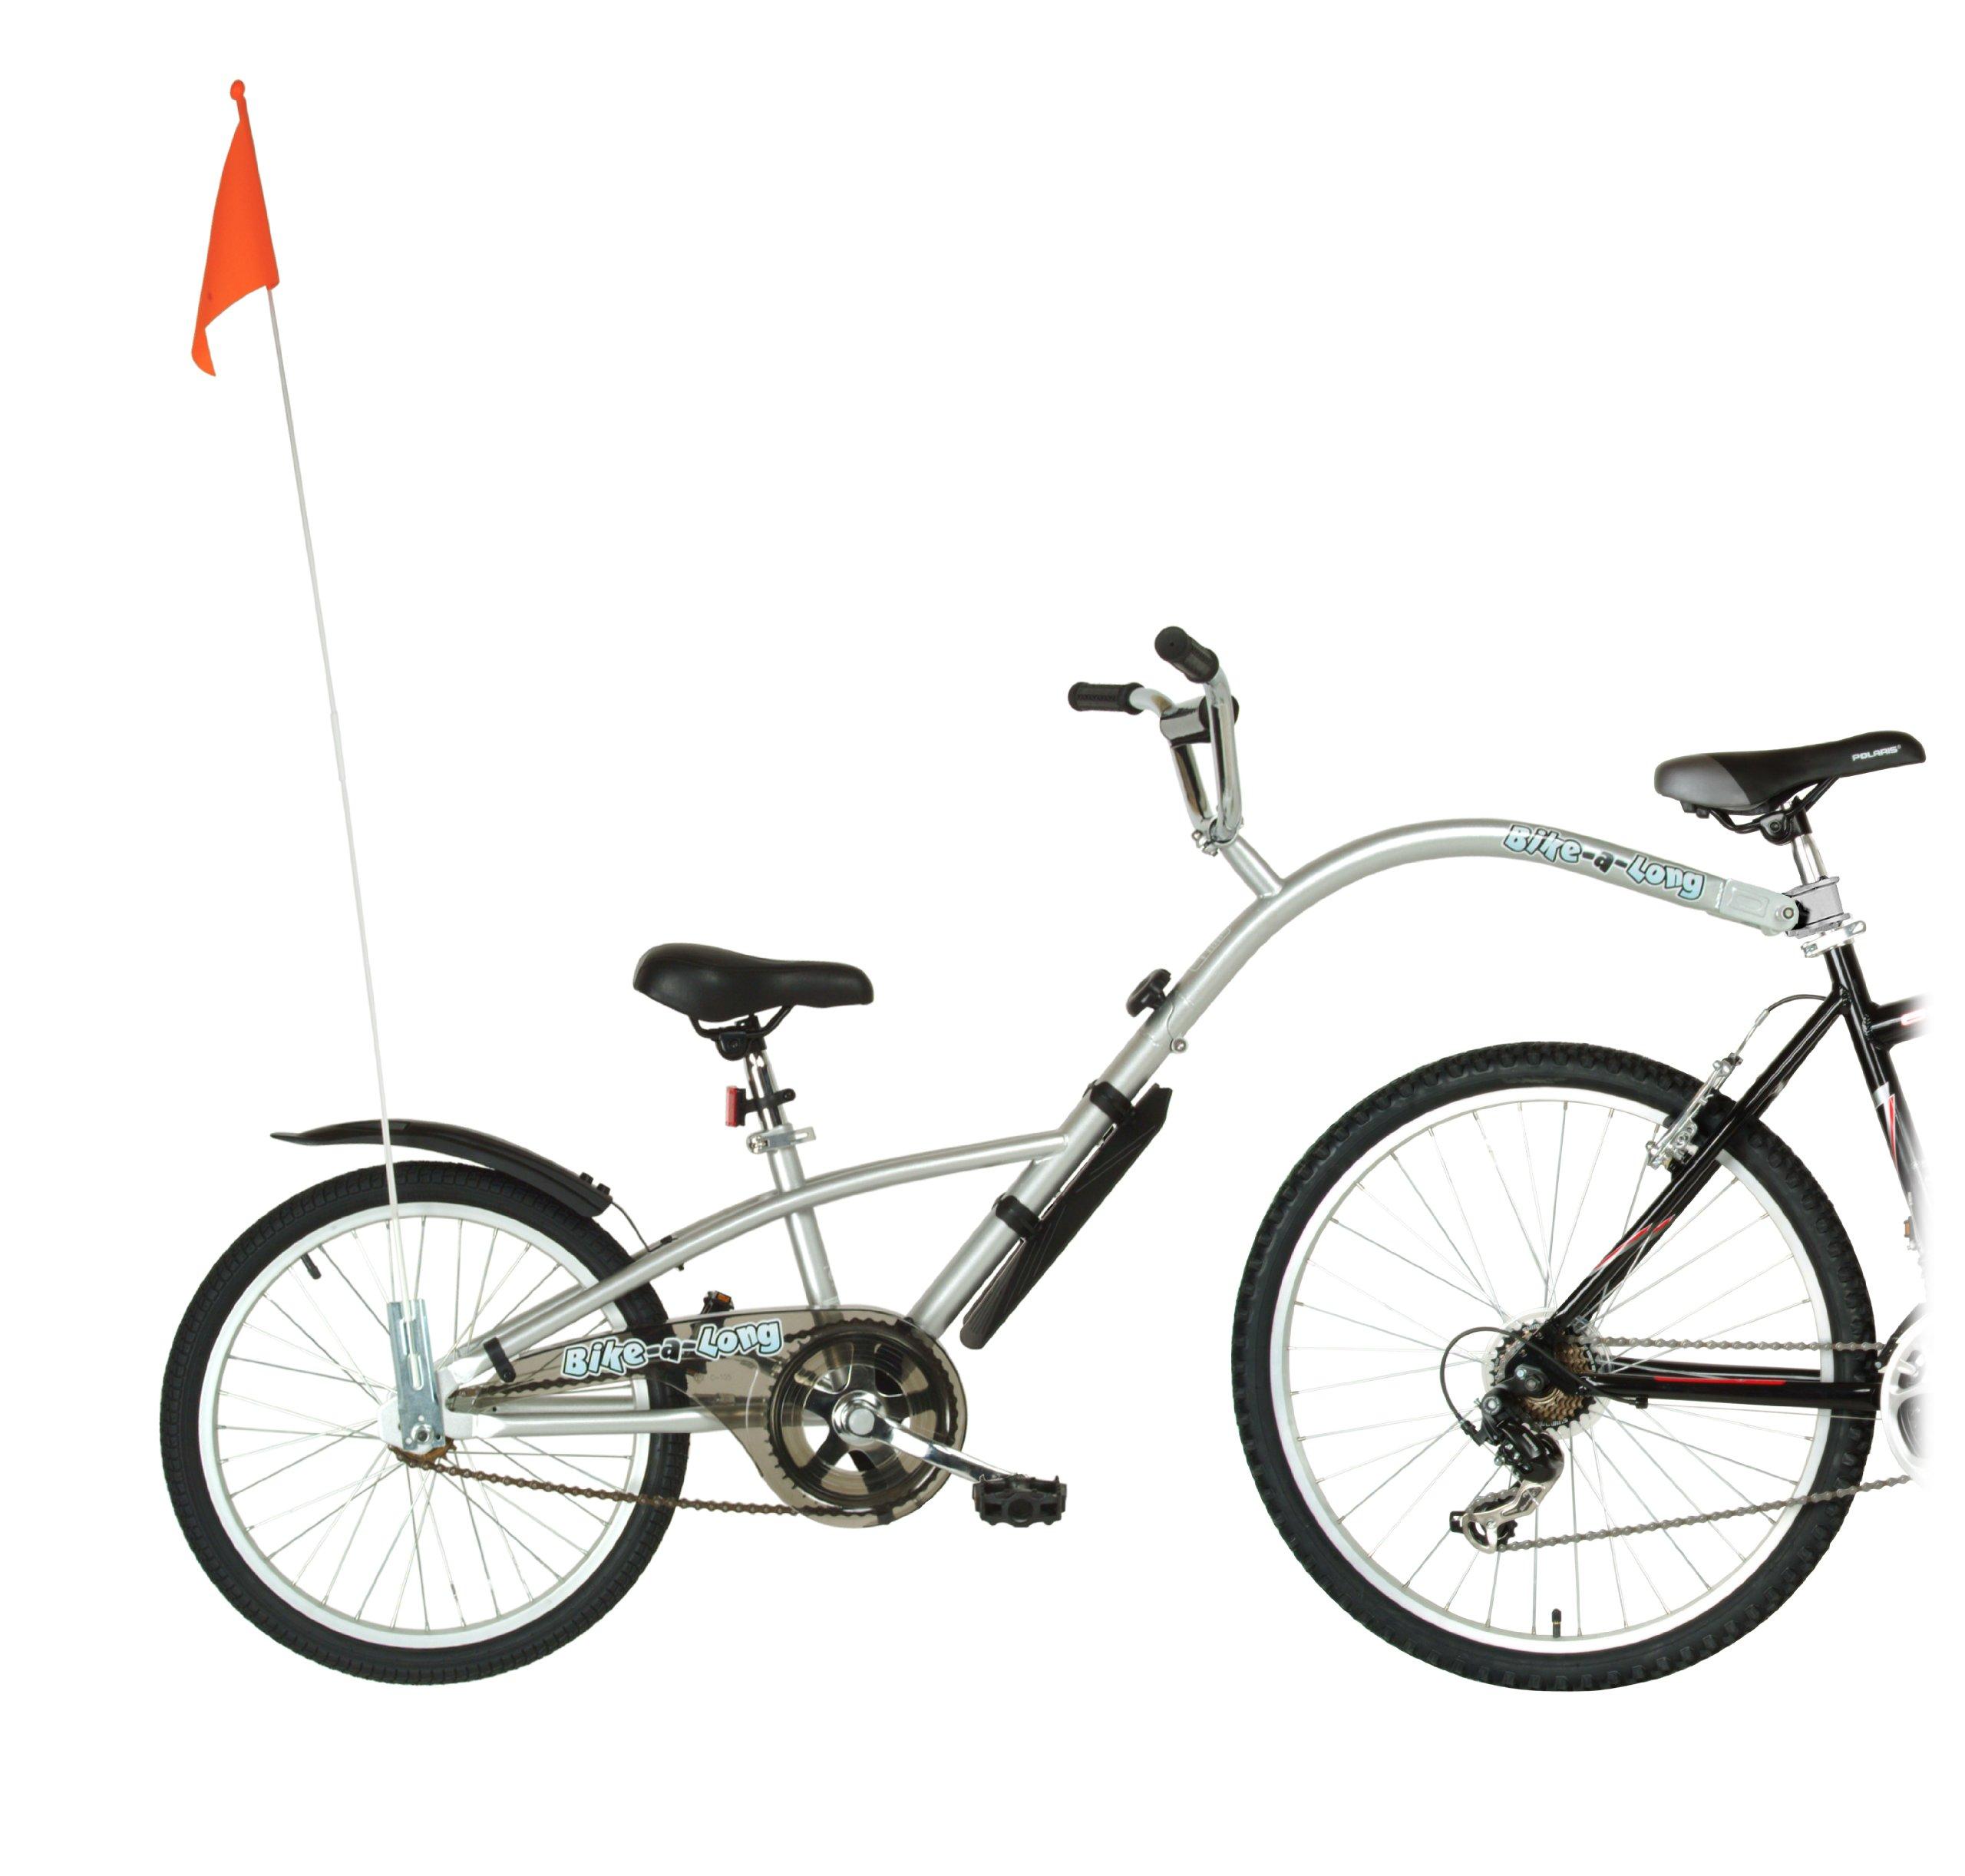 Bike-A-Long Trailer